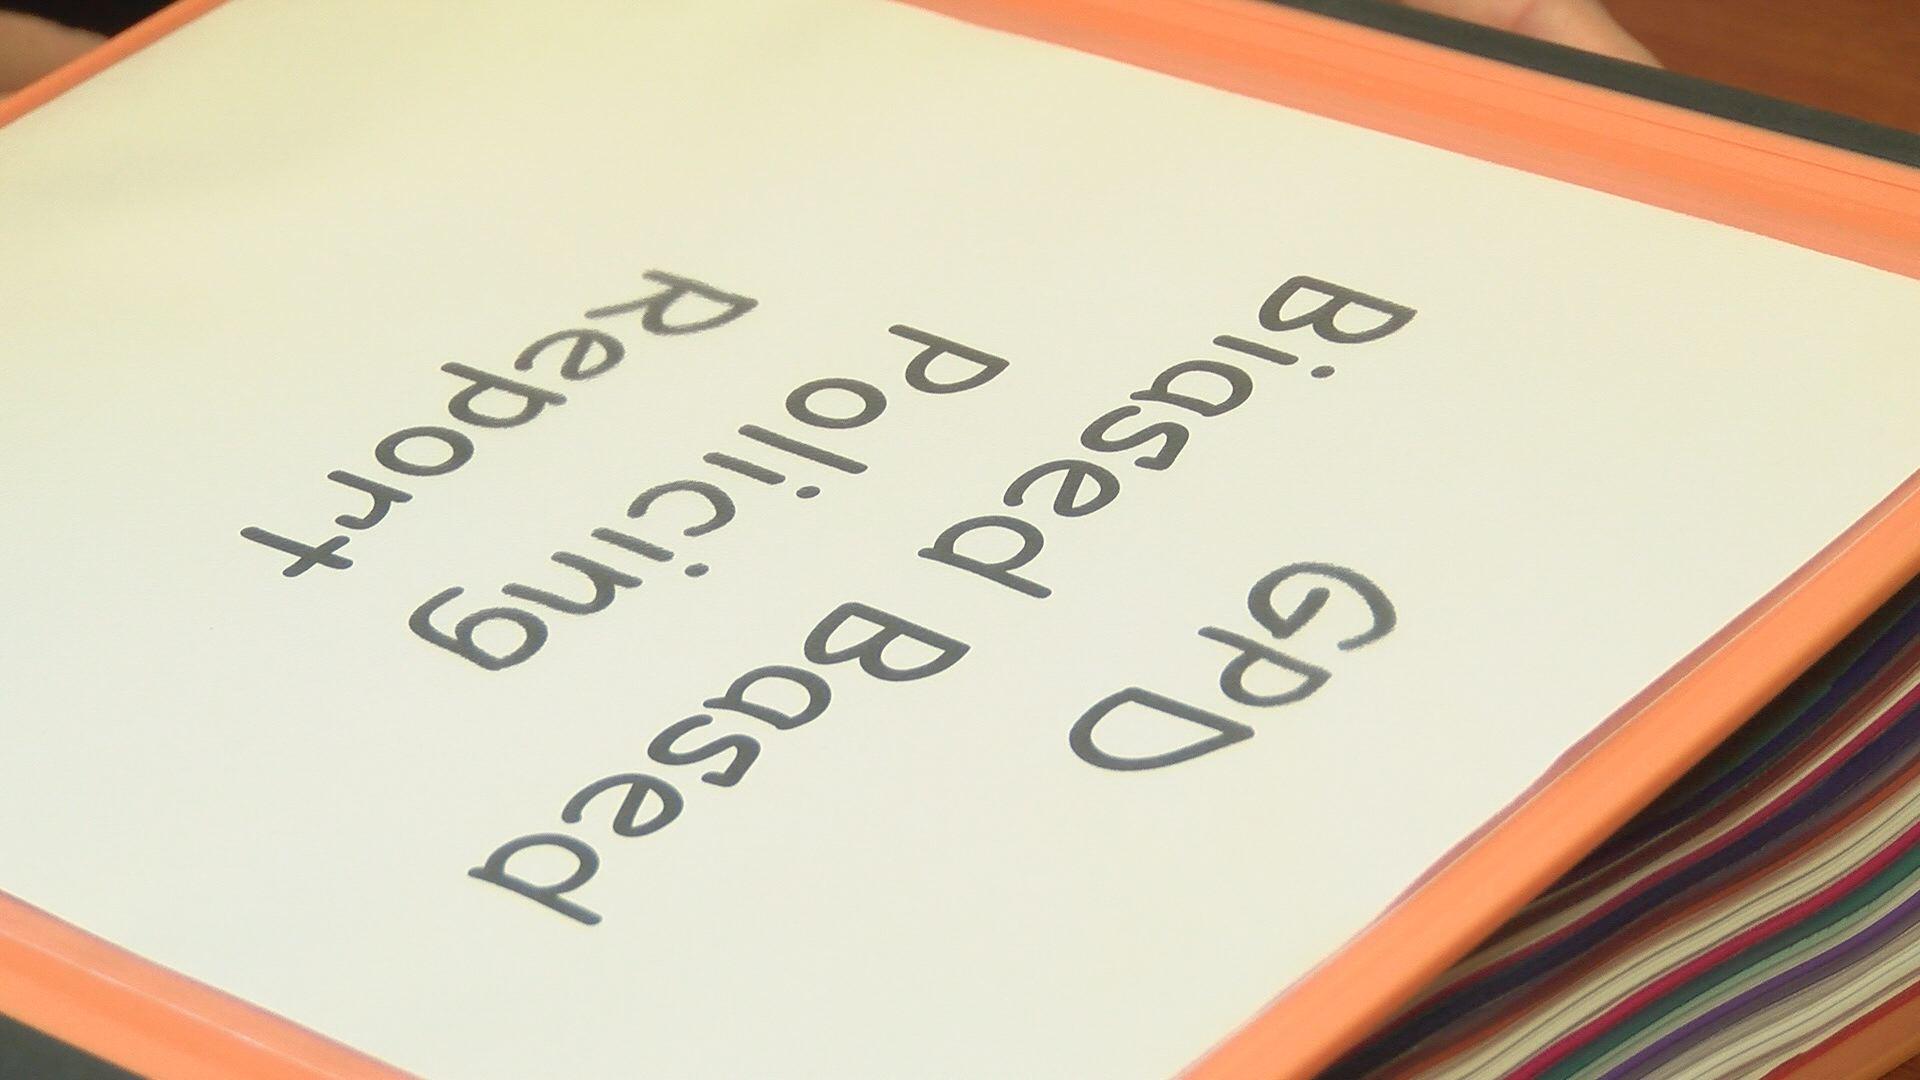 gpd-biased-based-policng_330218